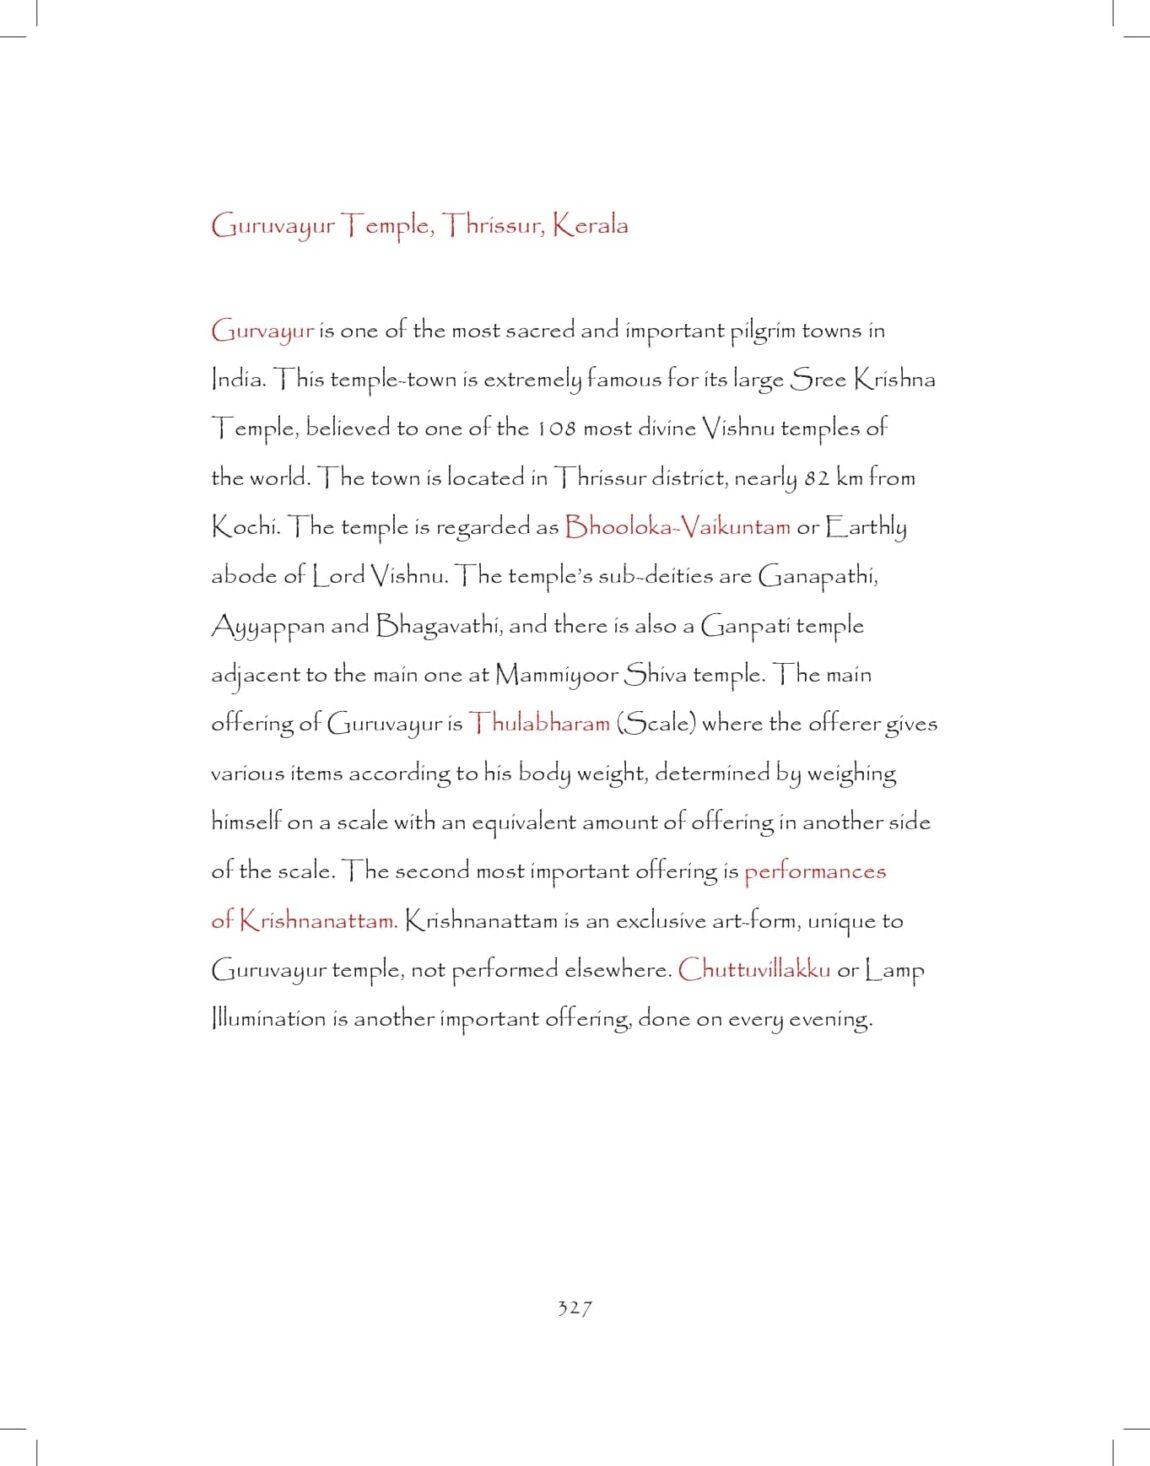 Ganesh-print_pages-to-jpg-0327.jpg